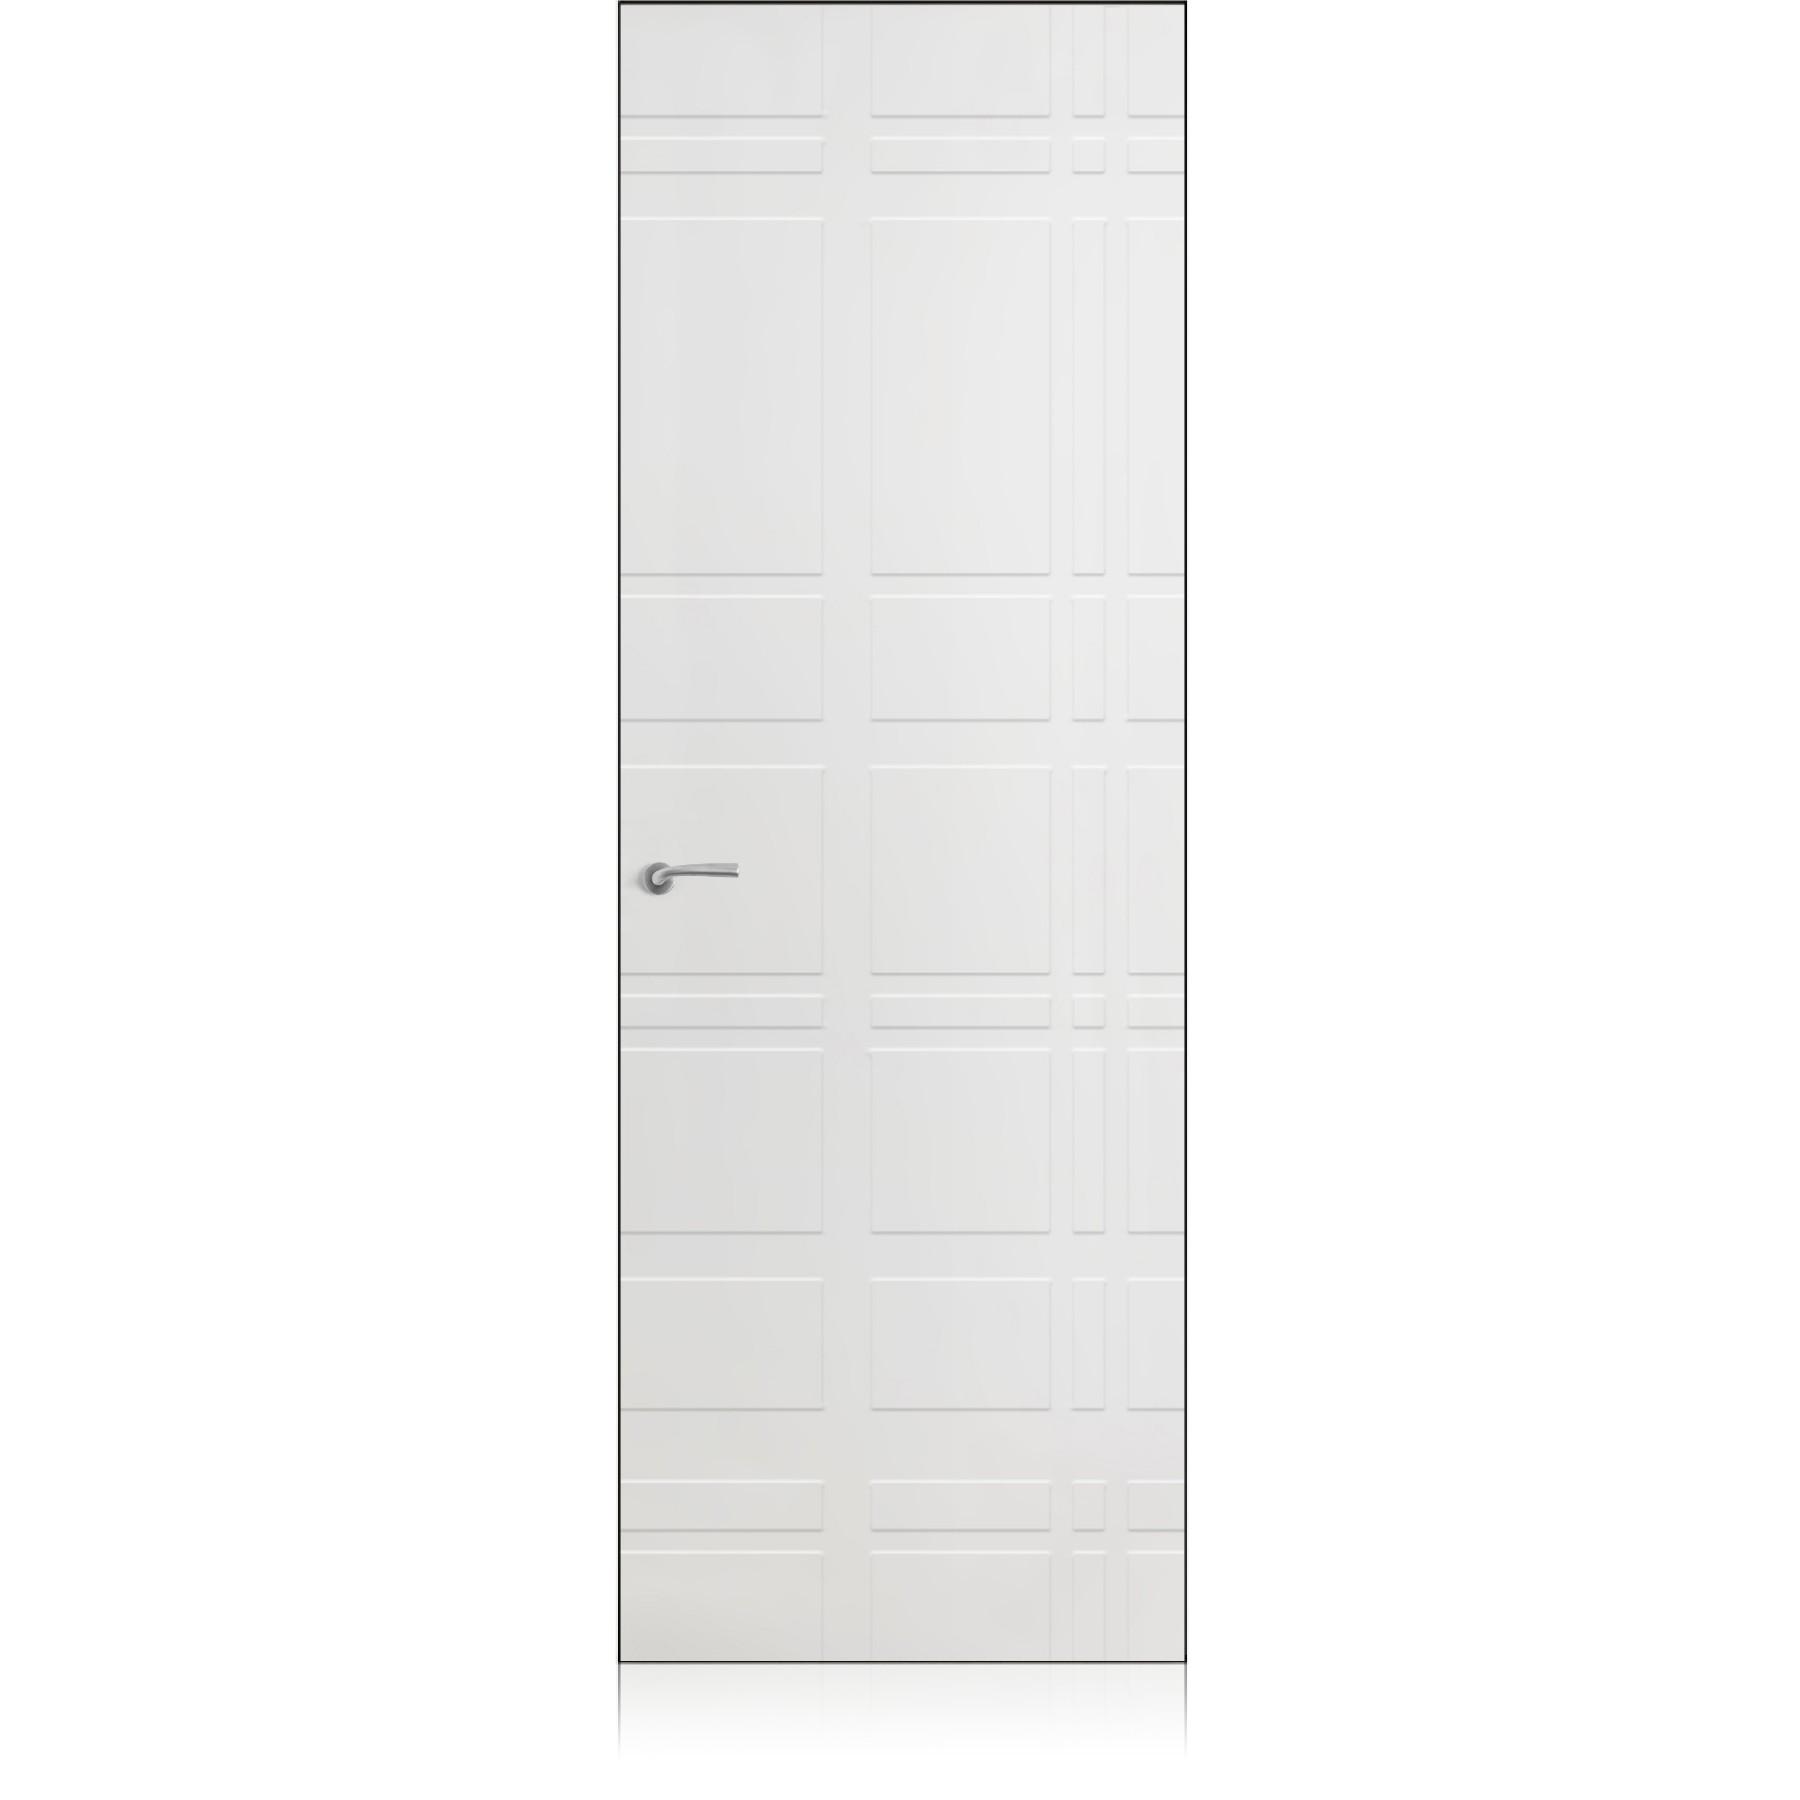 Yncisa Tartan Zero bianco optical door